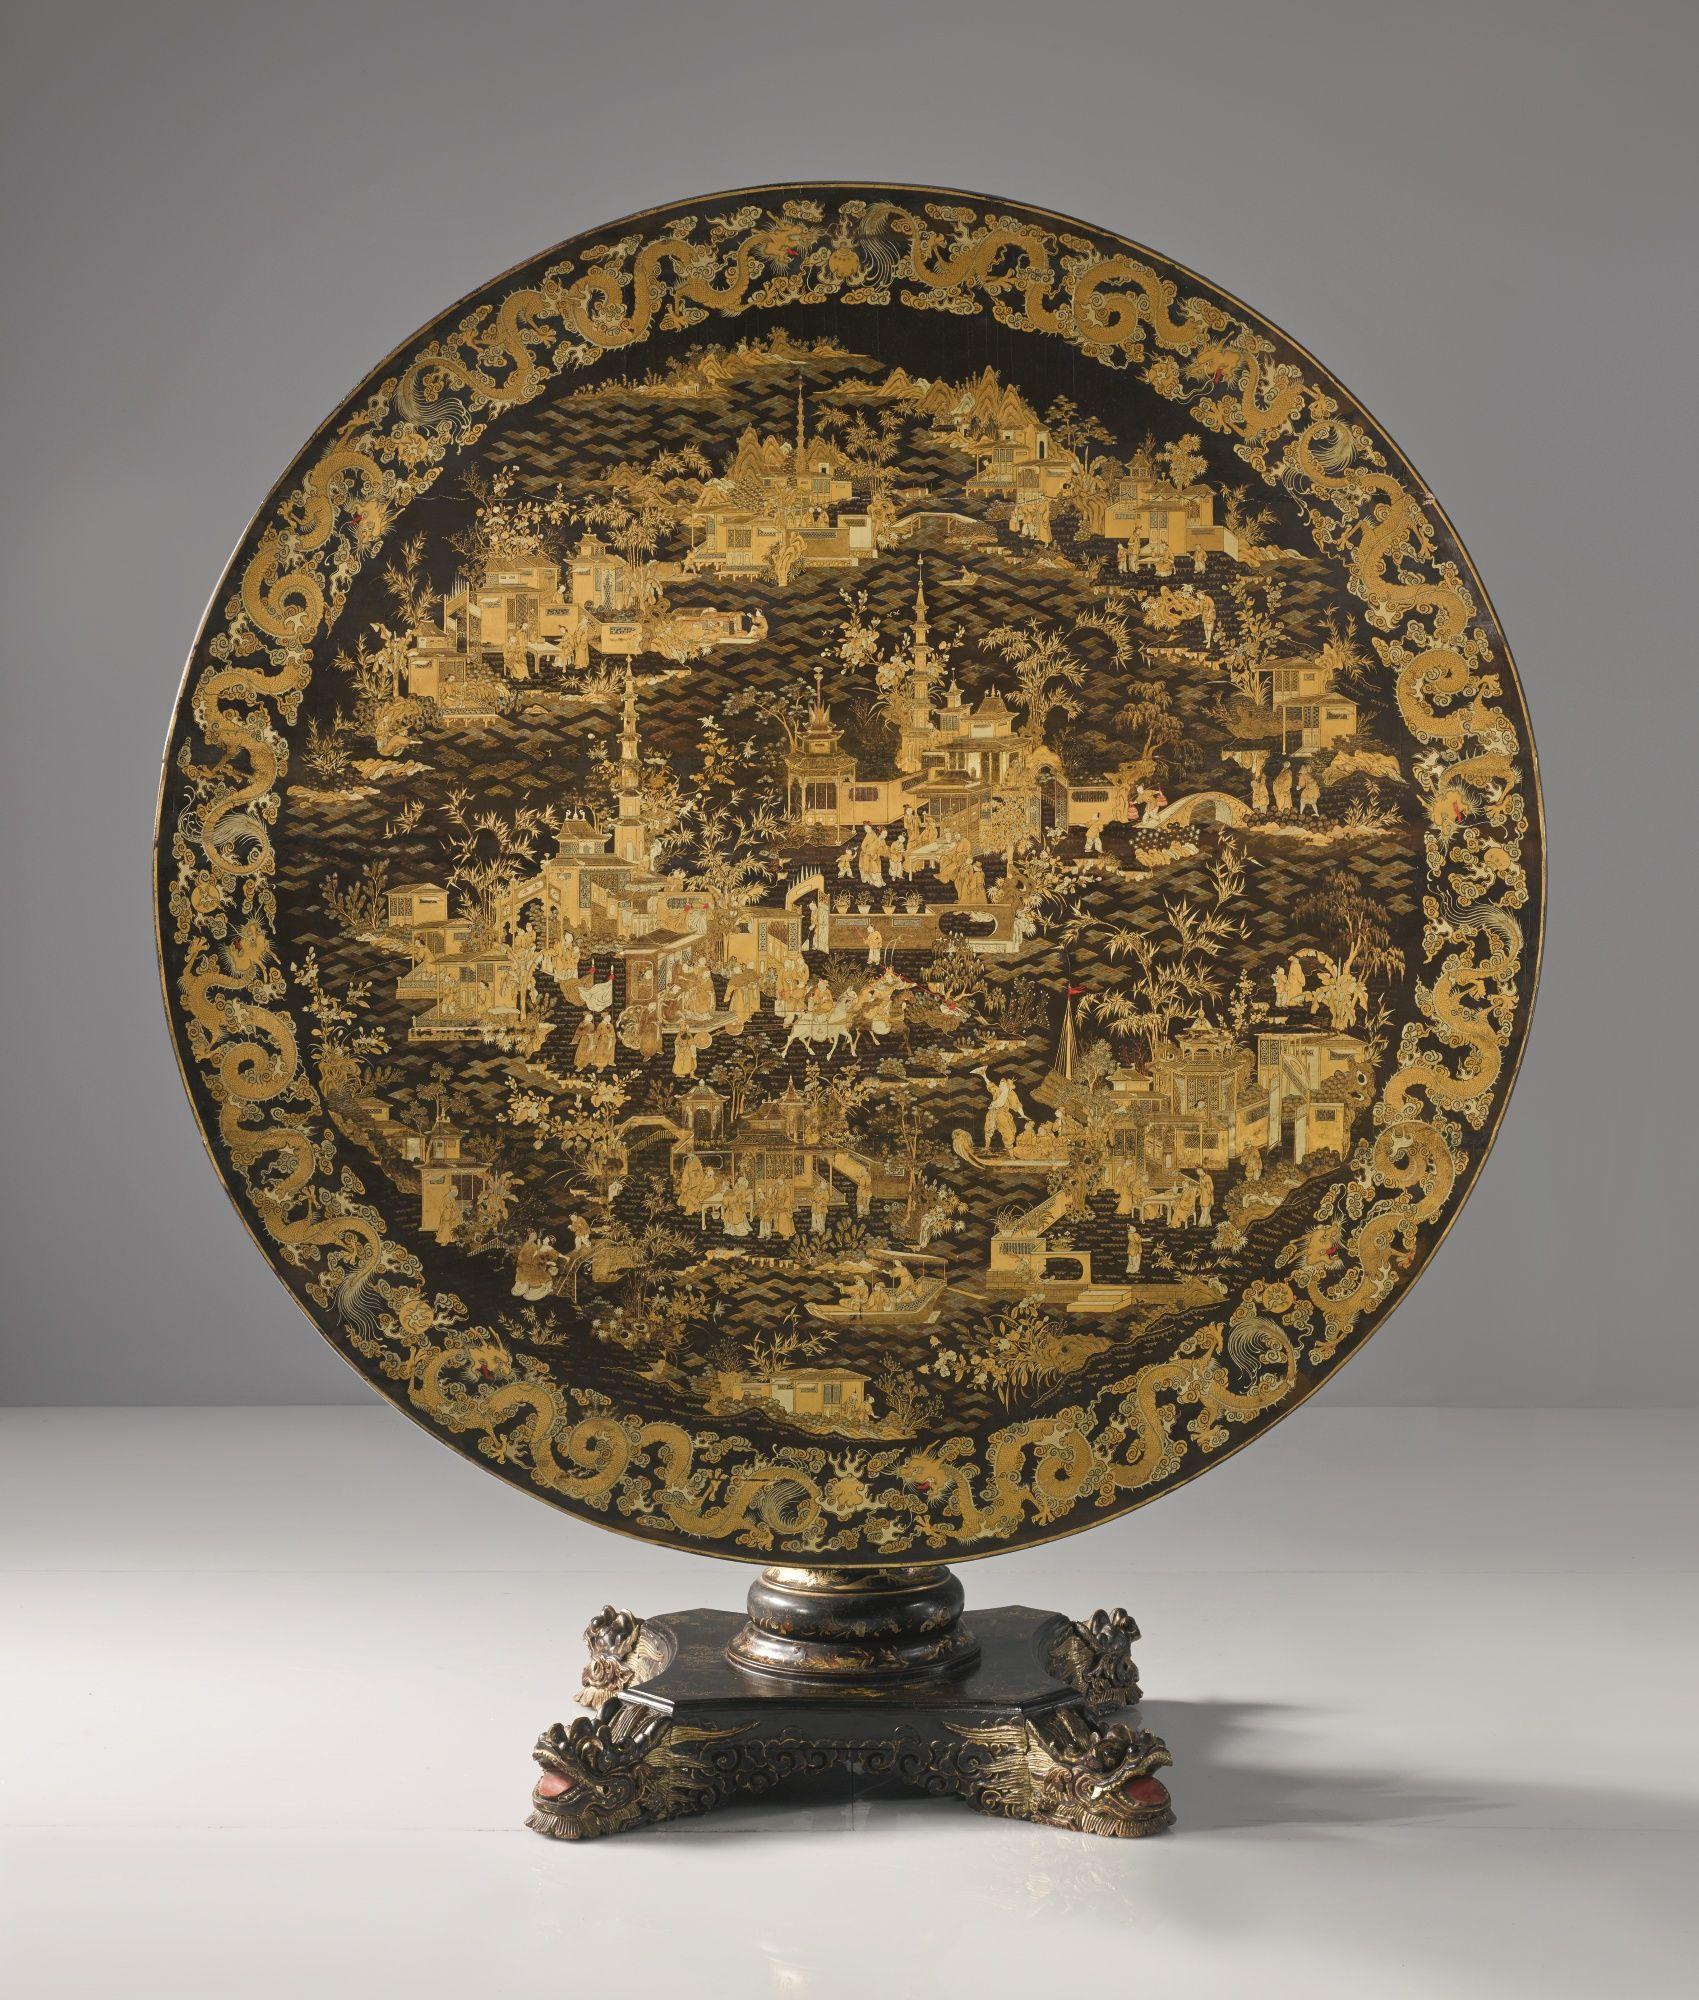 A chinese export parcel gilt black lacquer circular center table circa 1835 lot sotheby 39 s - Biombos chinos antiguos ...